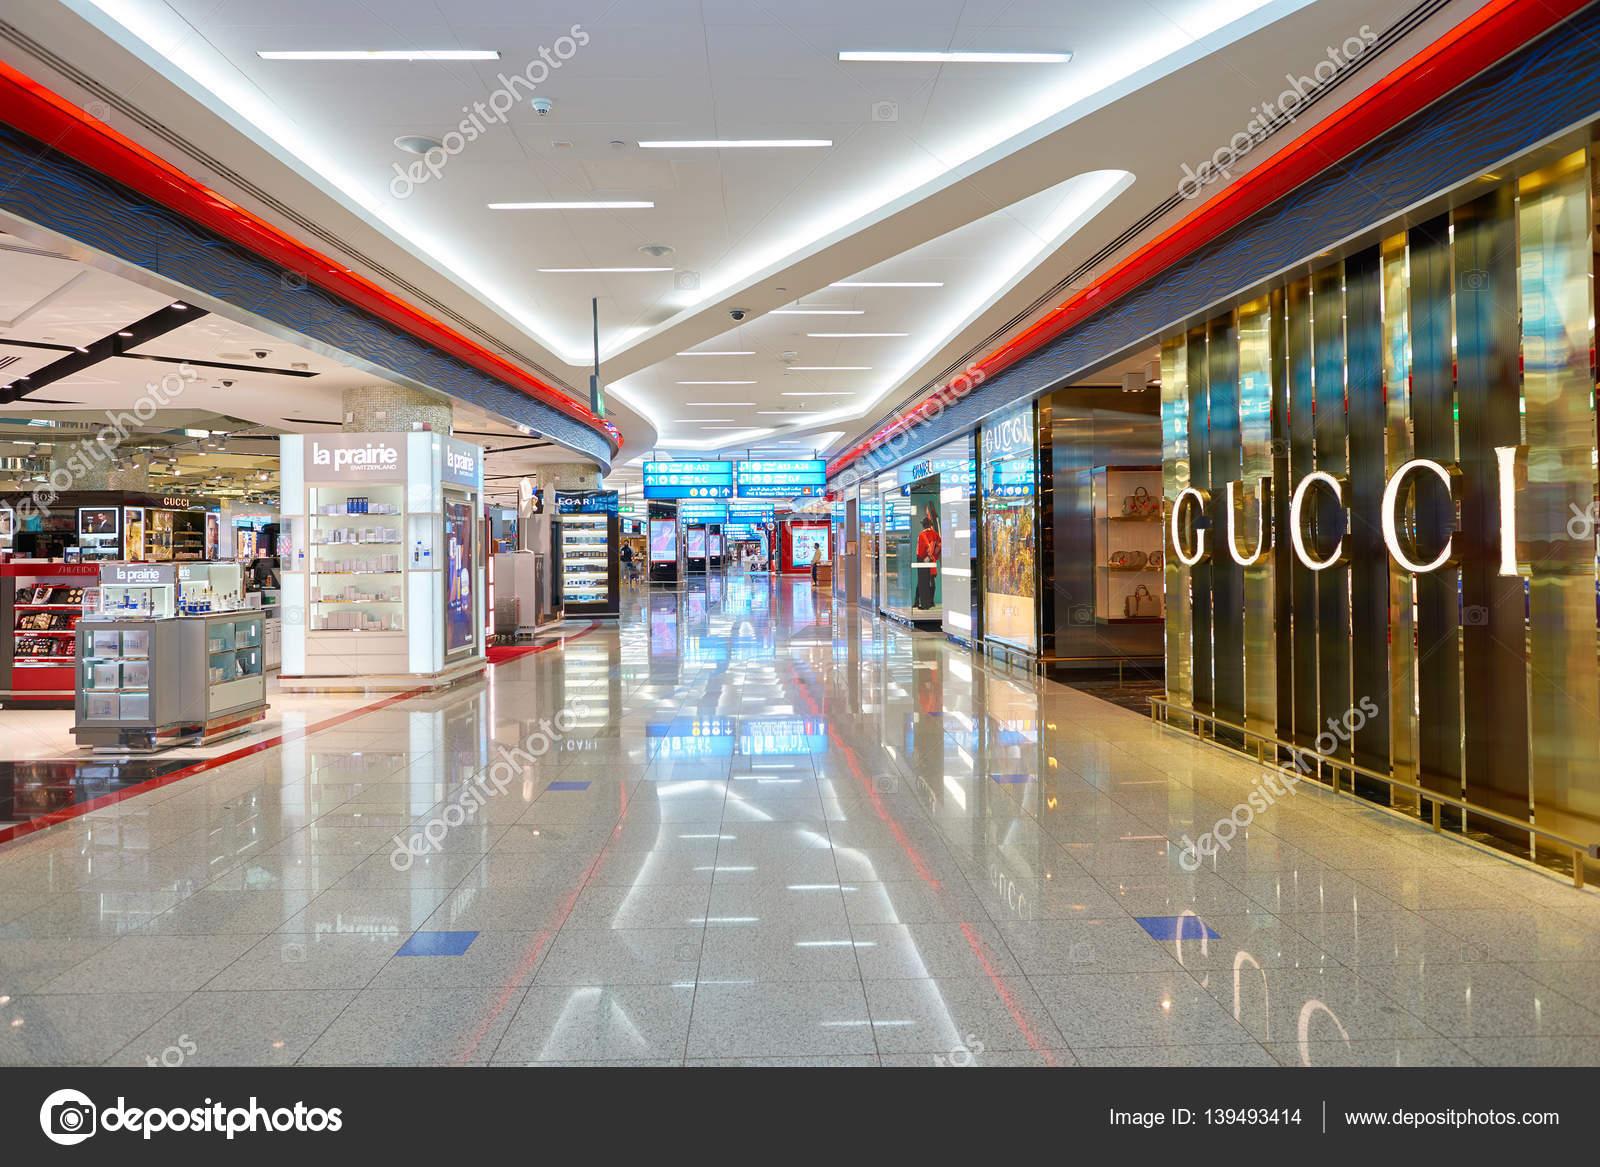 72a7c49b3ab Gucci shop at Dubai Airport – Stock Editorial Photo © teamtime ...